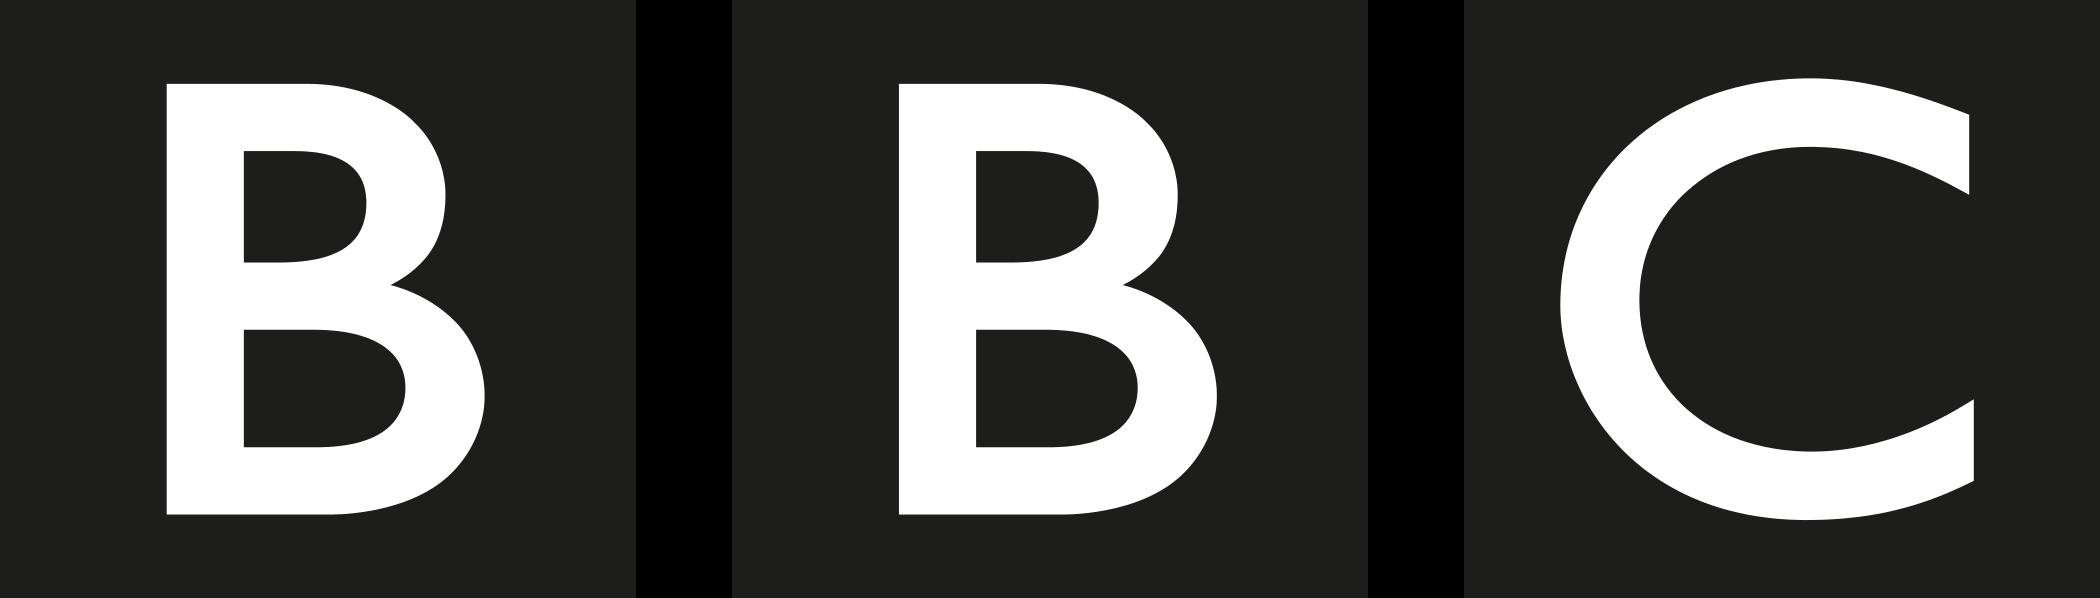 bbc logo 1 - BBC Logo